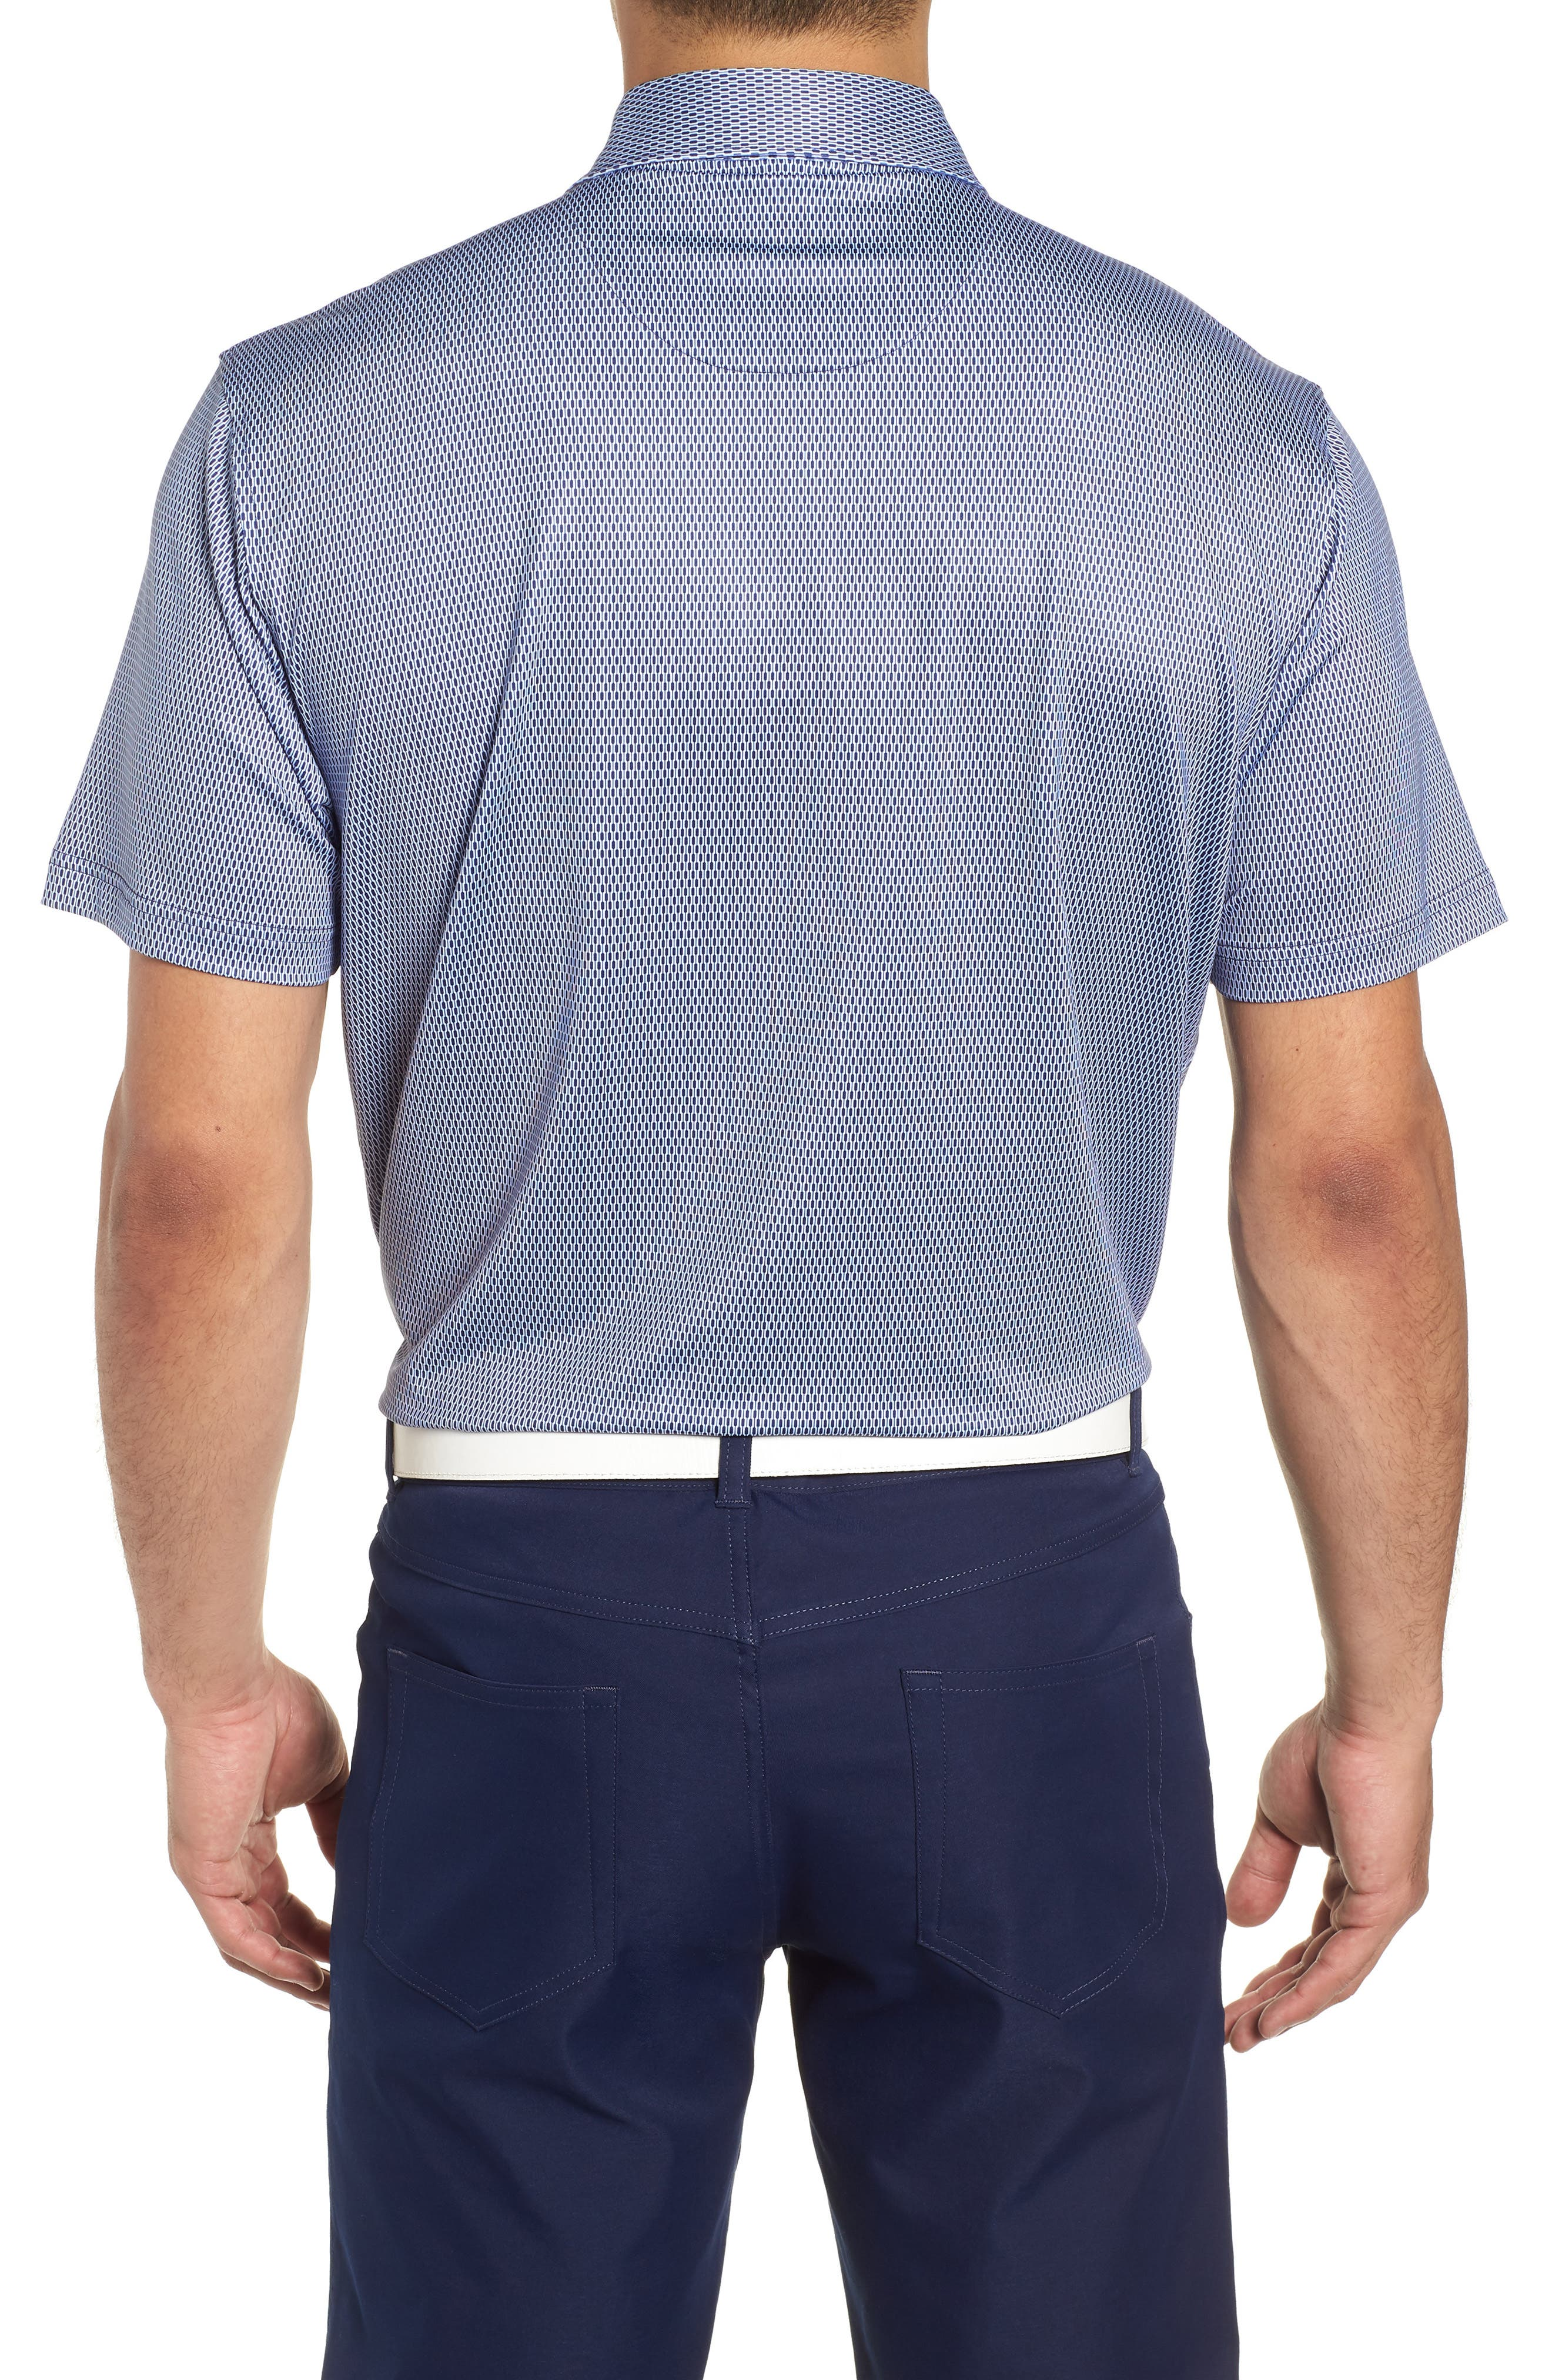 Latimer Classic Fit Links Print Golf Polo,                             Alternate thumbnail 2, color,                             410